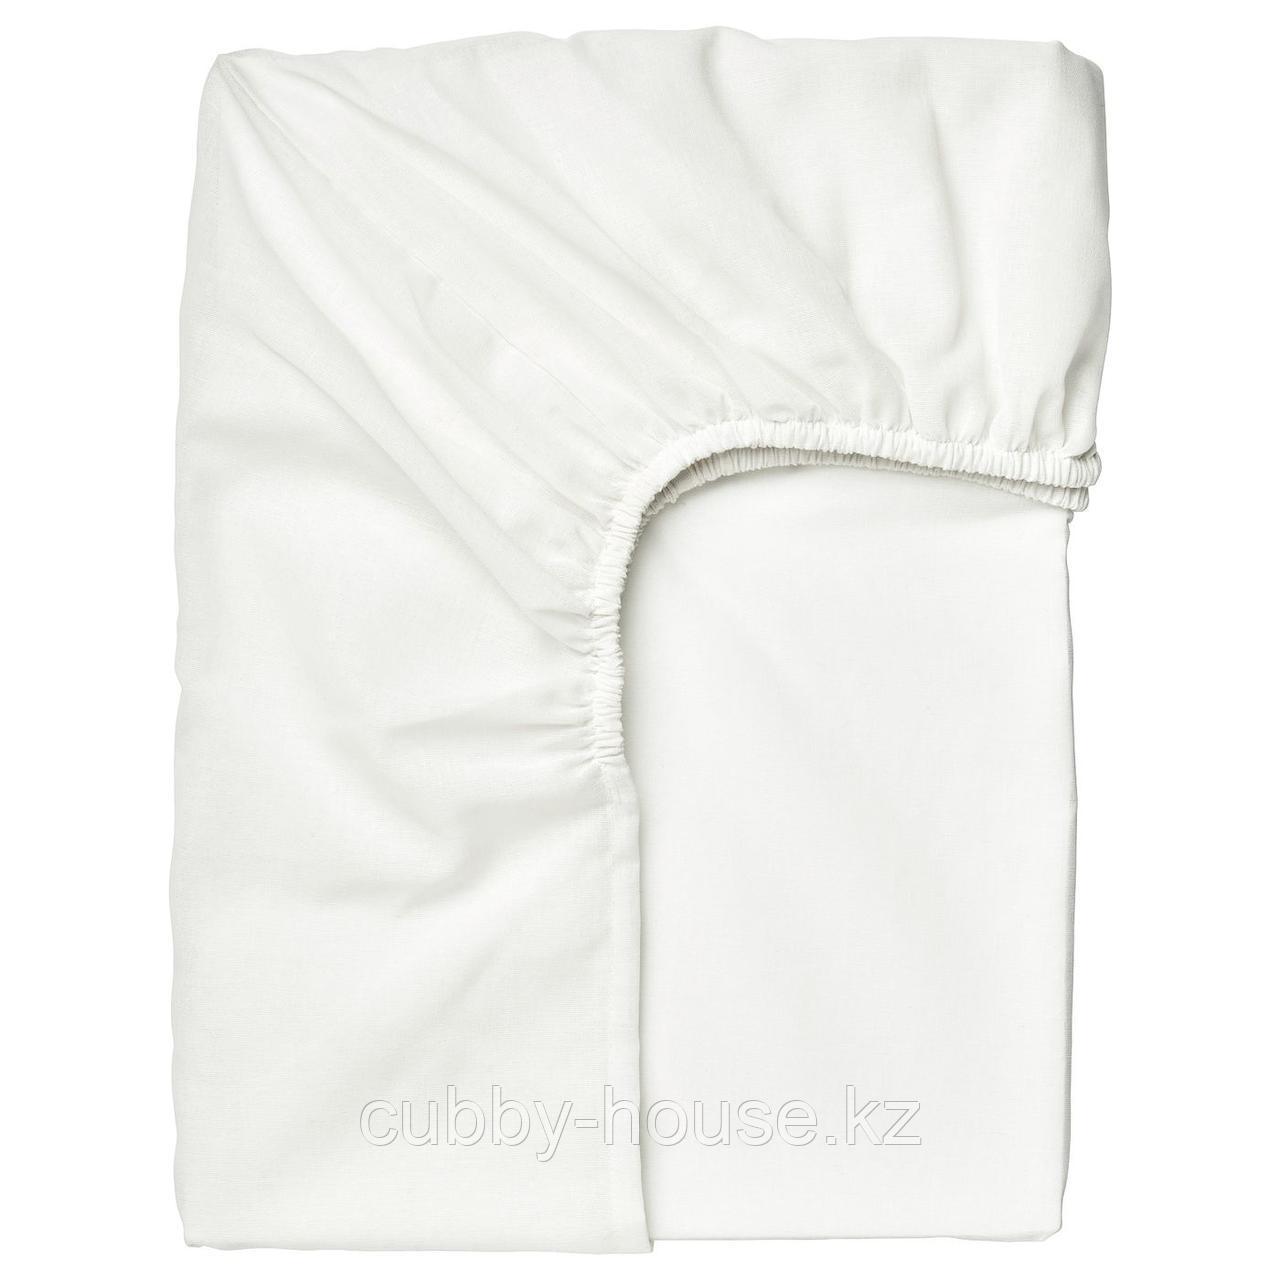 ТАГГВАЛЛЬМО Простыня натяжная, белый, 90x200 см